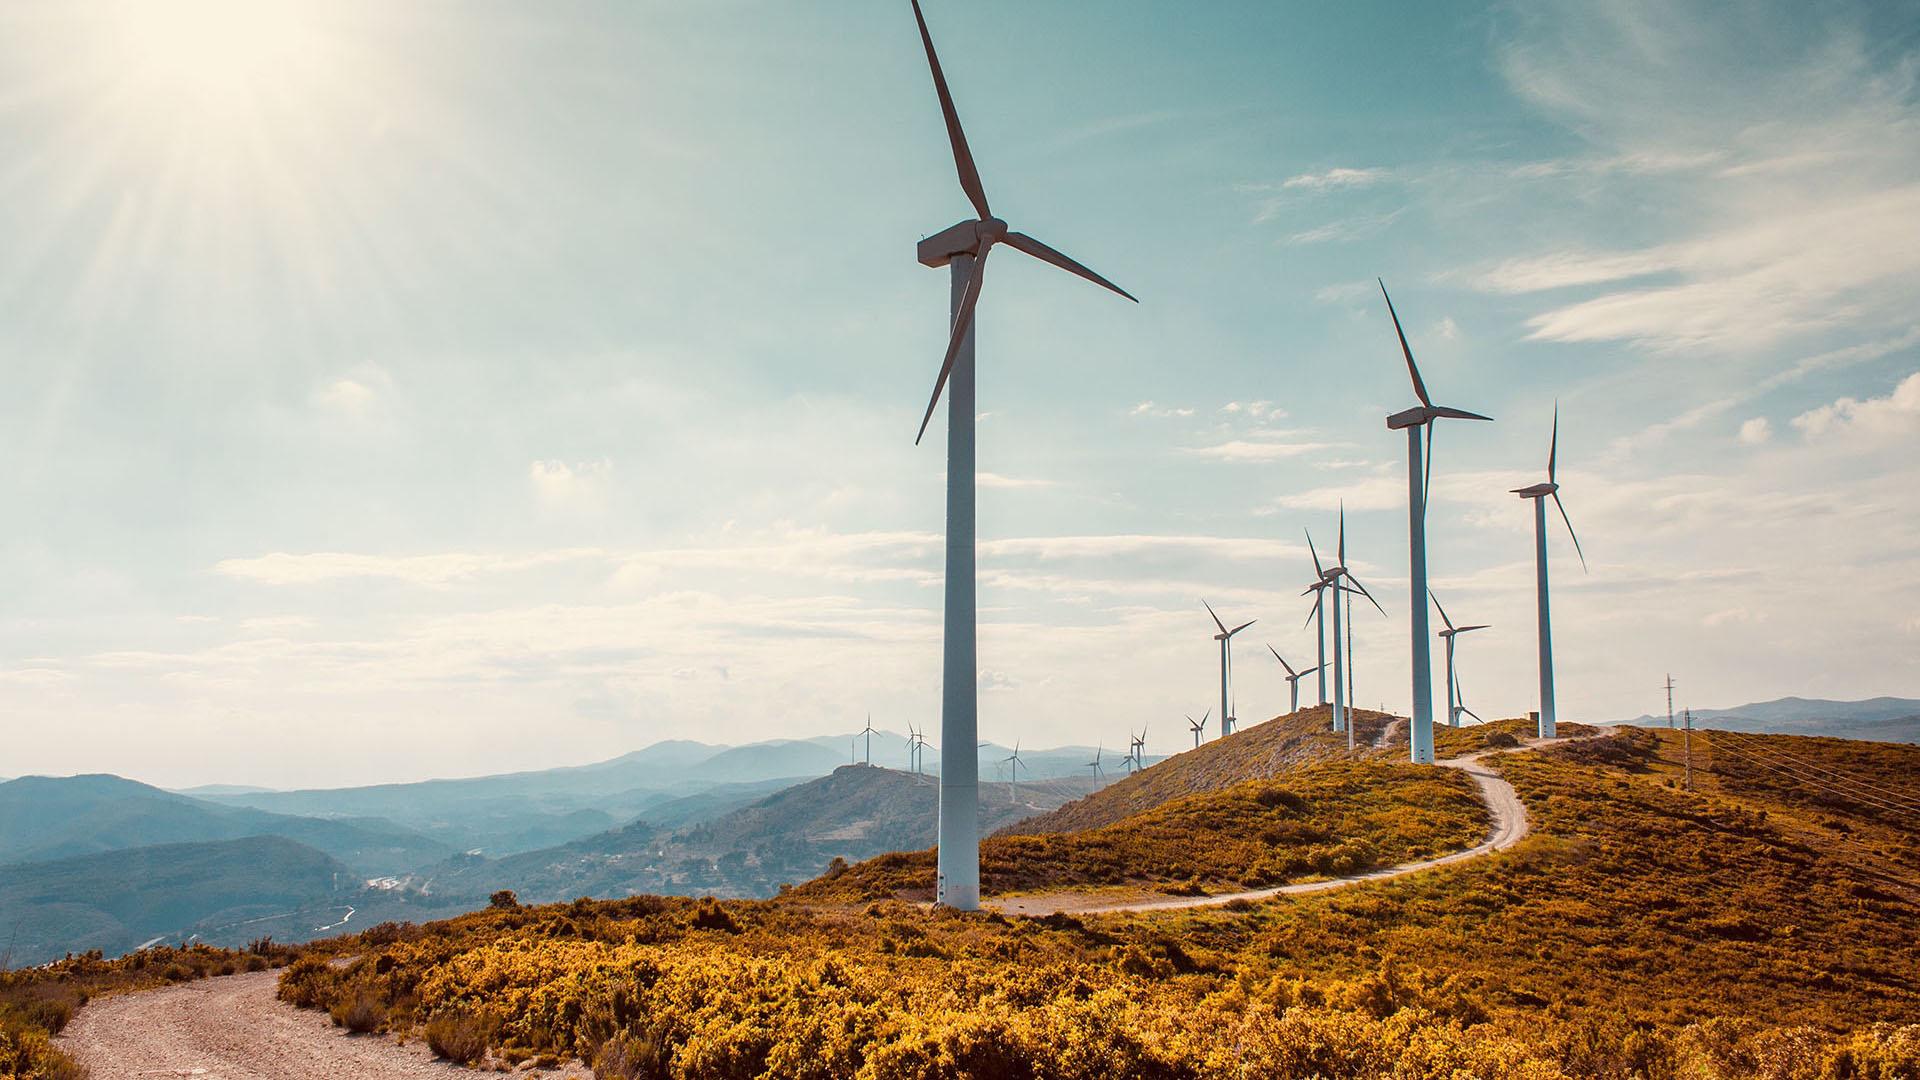 We just finished Brunow-Klesste Wind Farm WTG installation 1